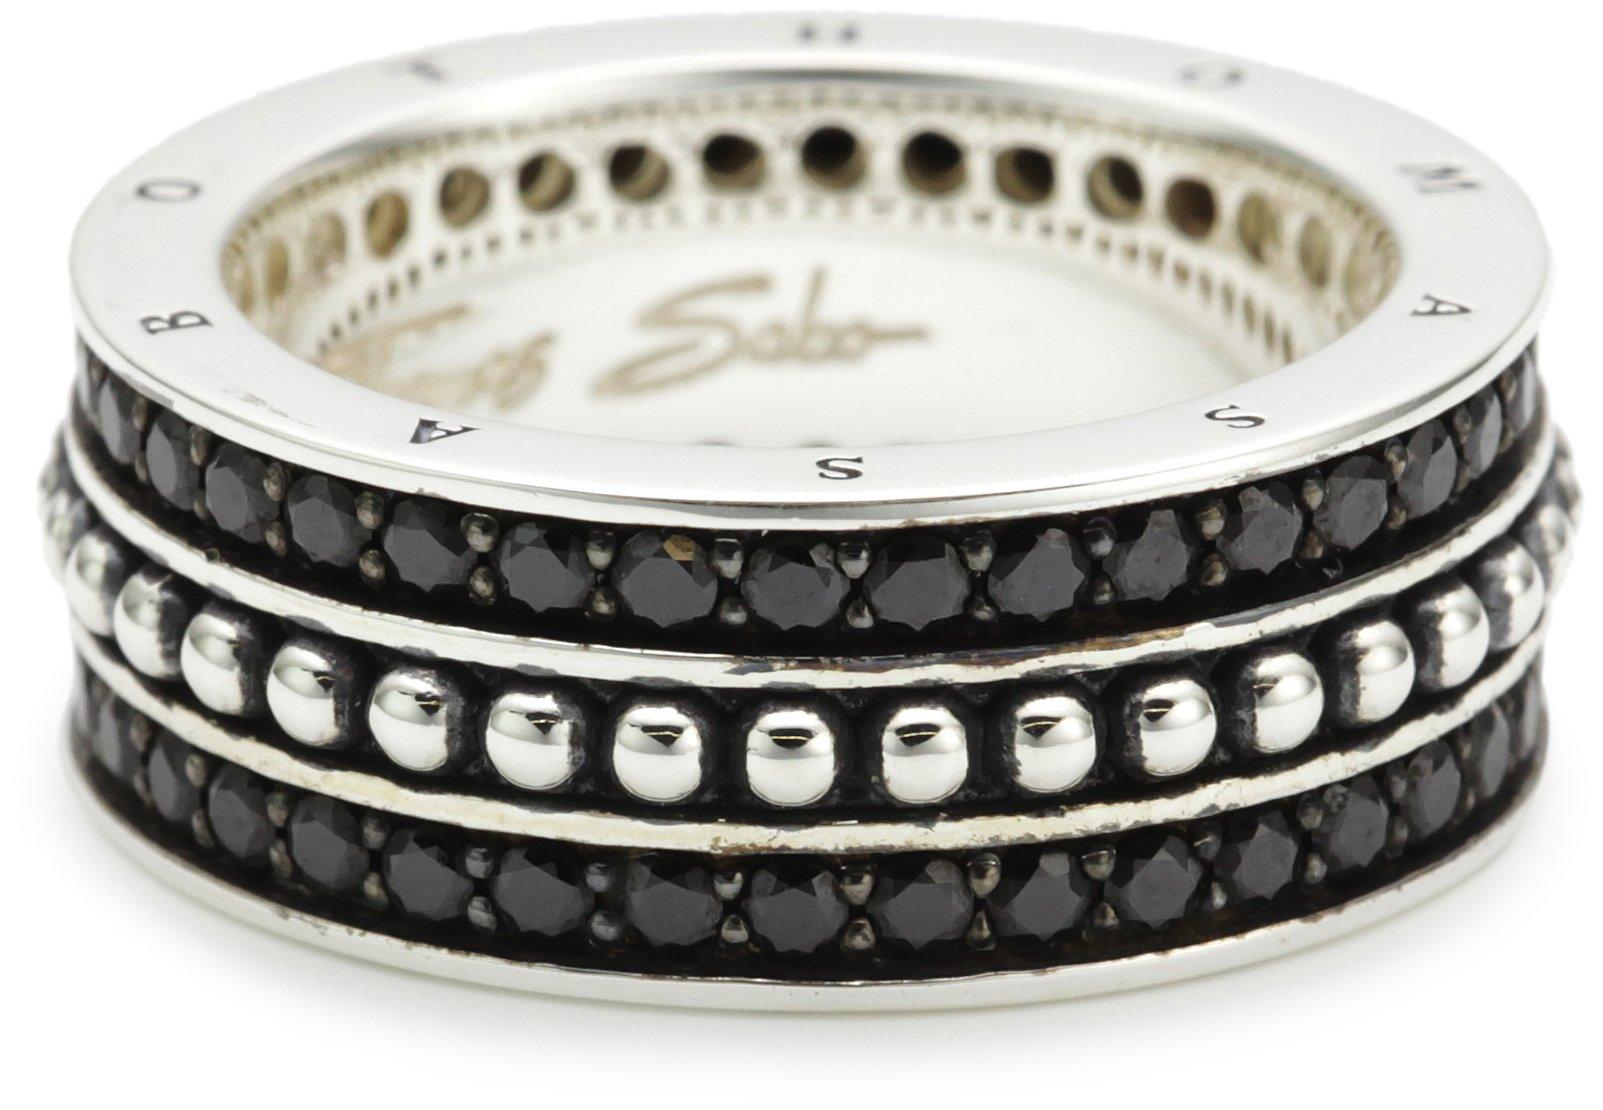 Unisex-Ring Sterling-Silber 925 TR1879-051-11-58